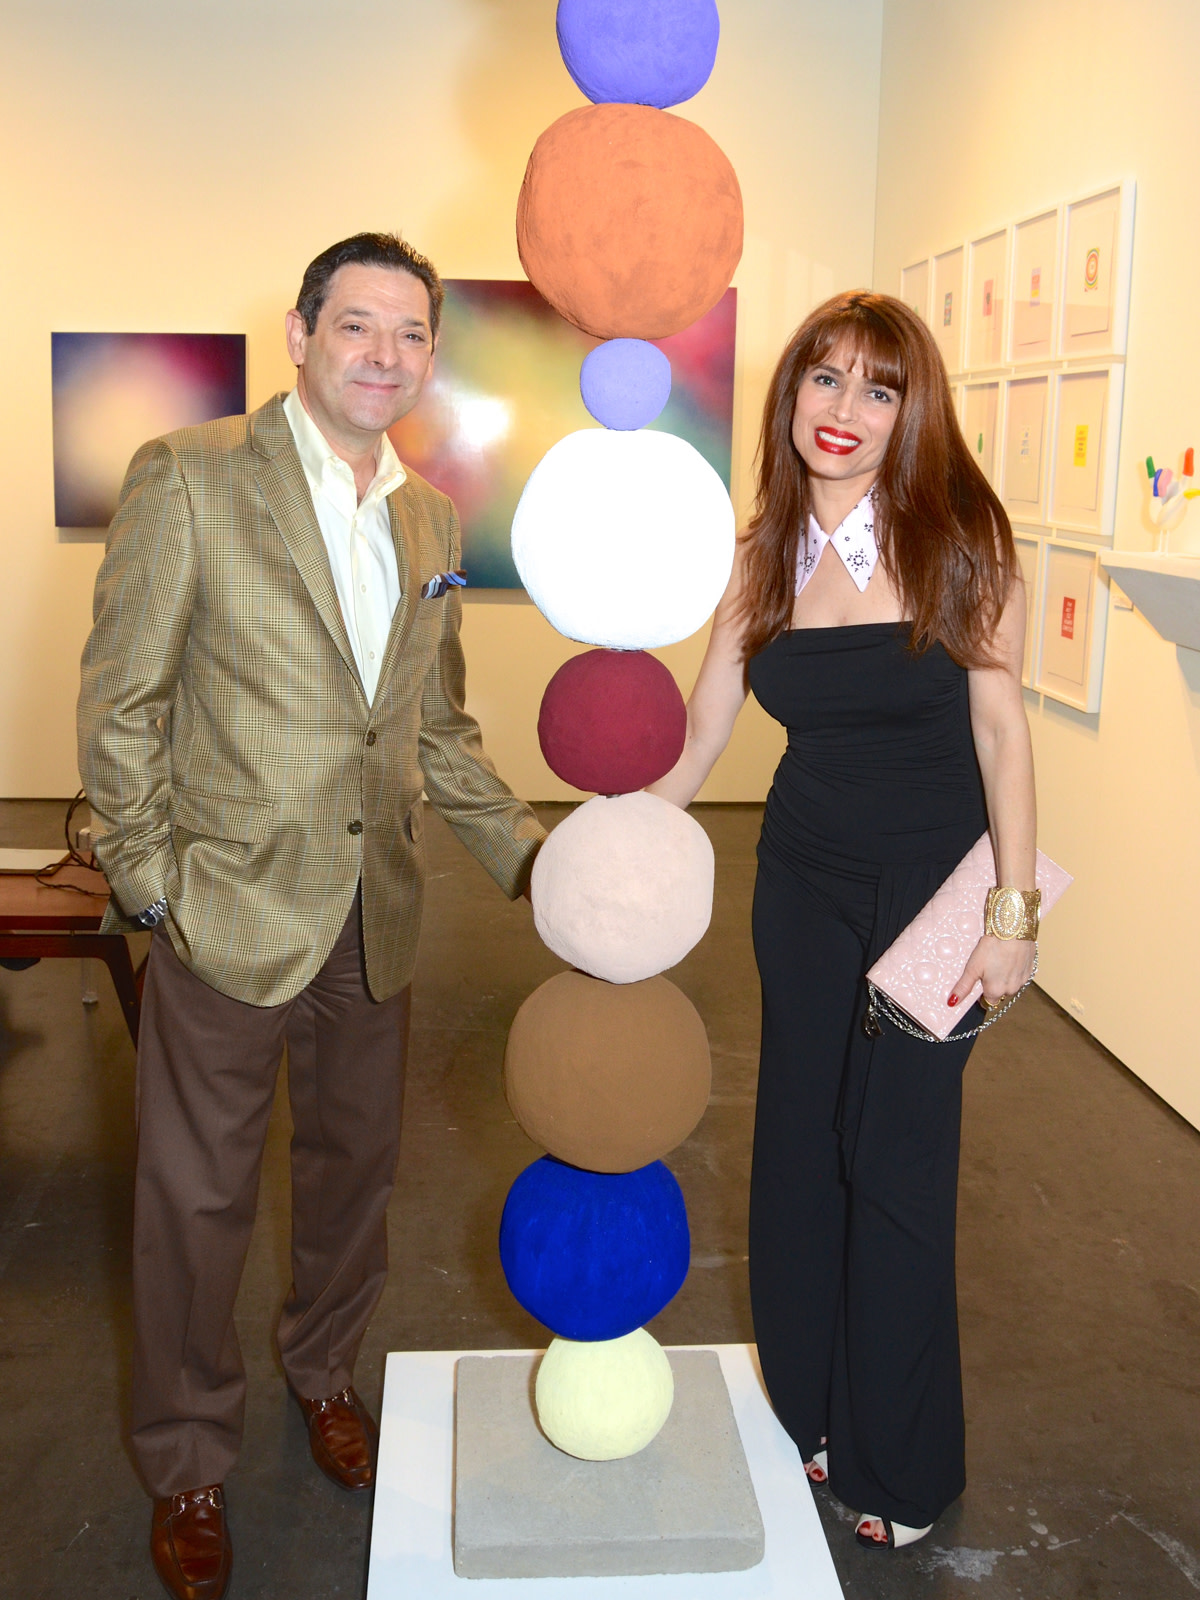 News, Shelby, Texas Contemporary, Oct. 2015, Carlos Barbieri, Karina Barbieri